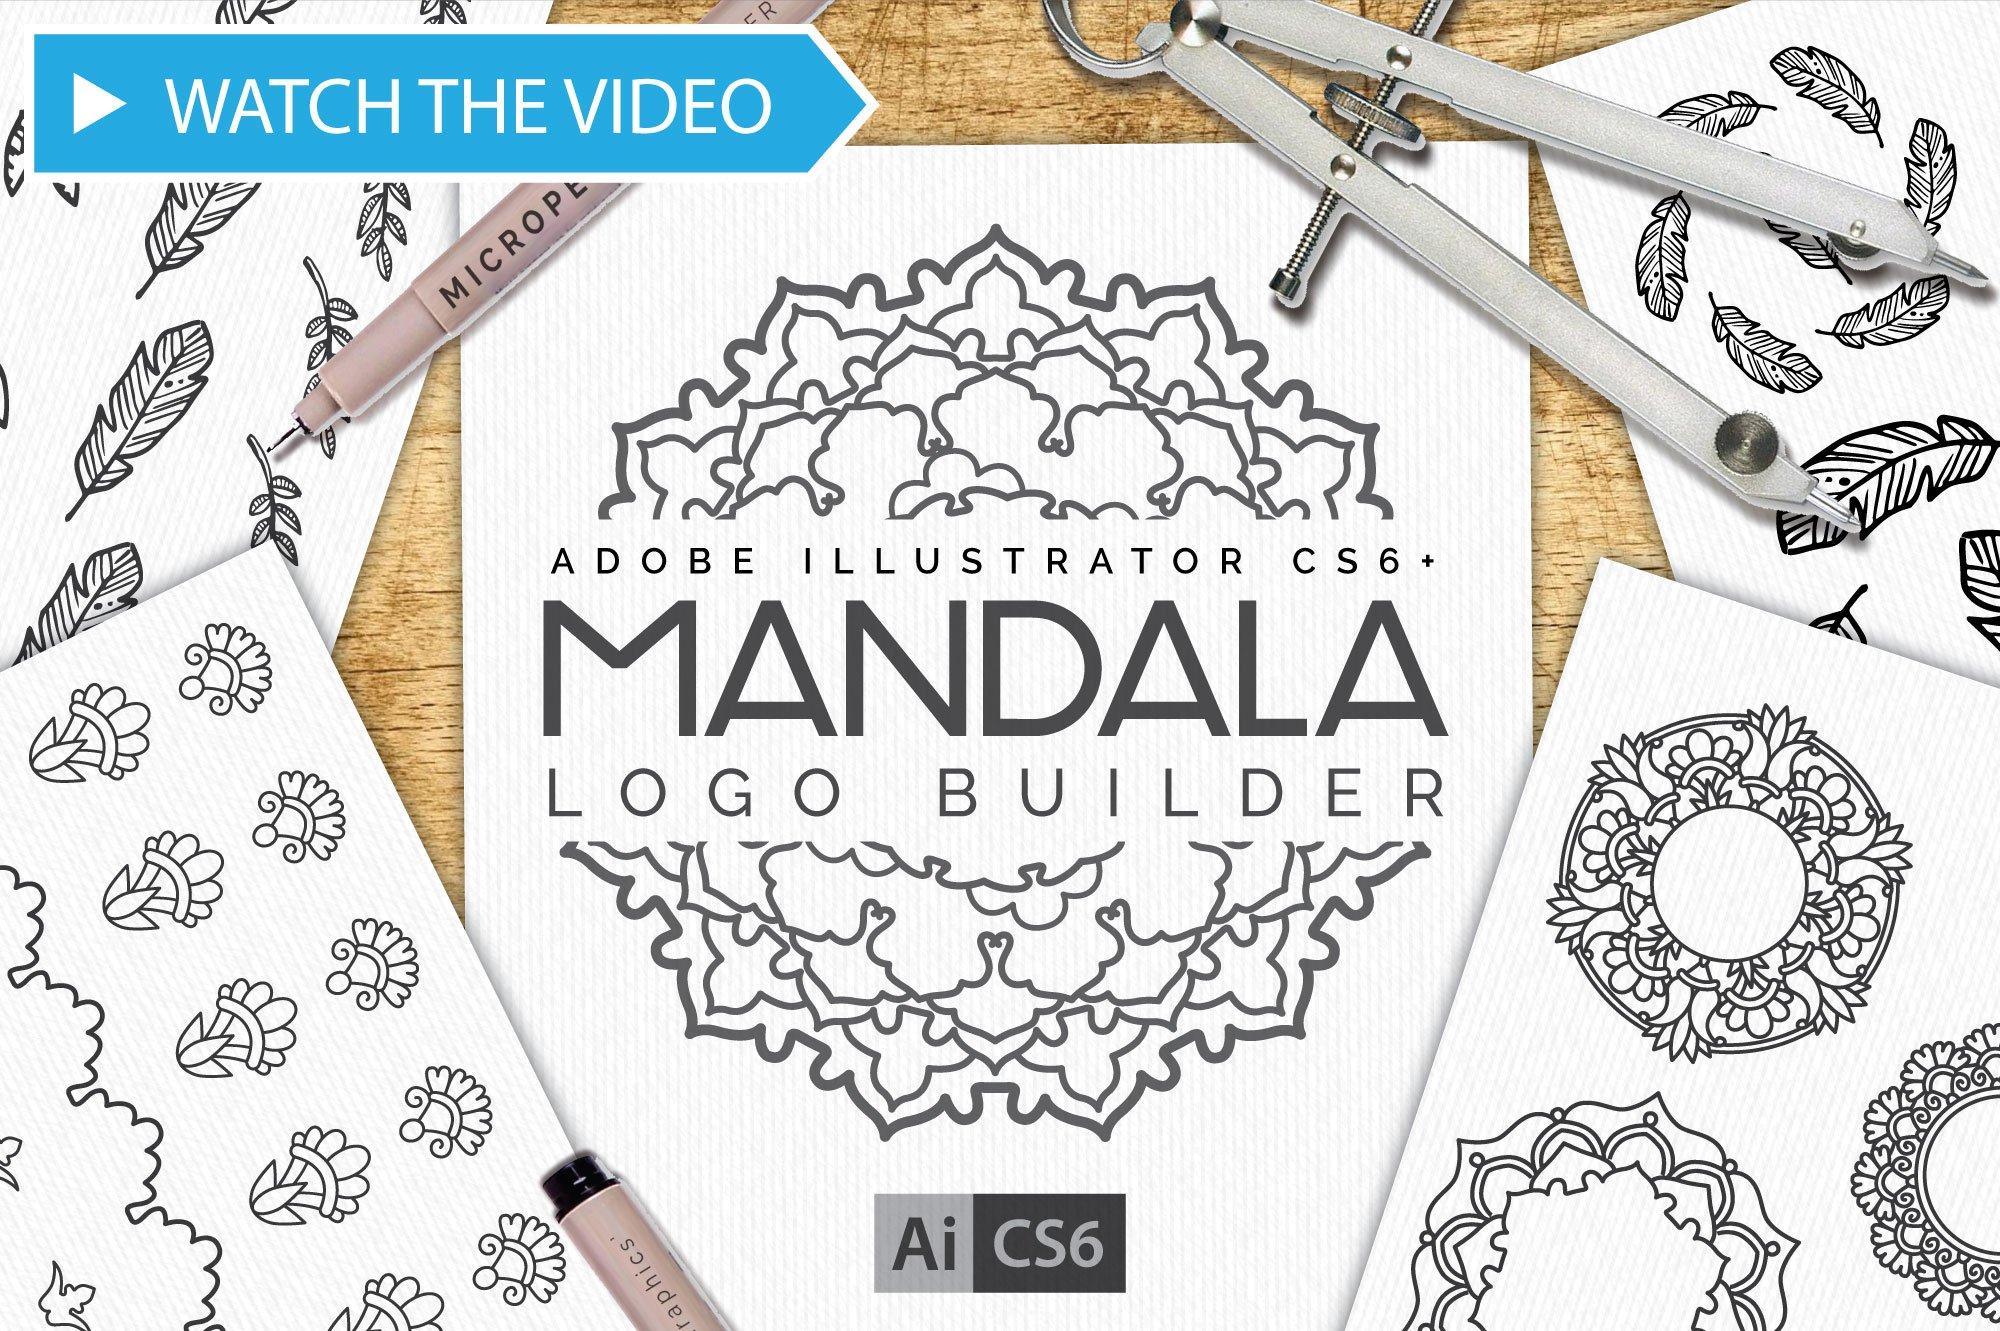 mandala logo creator kit cs6 actions creative market